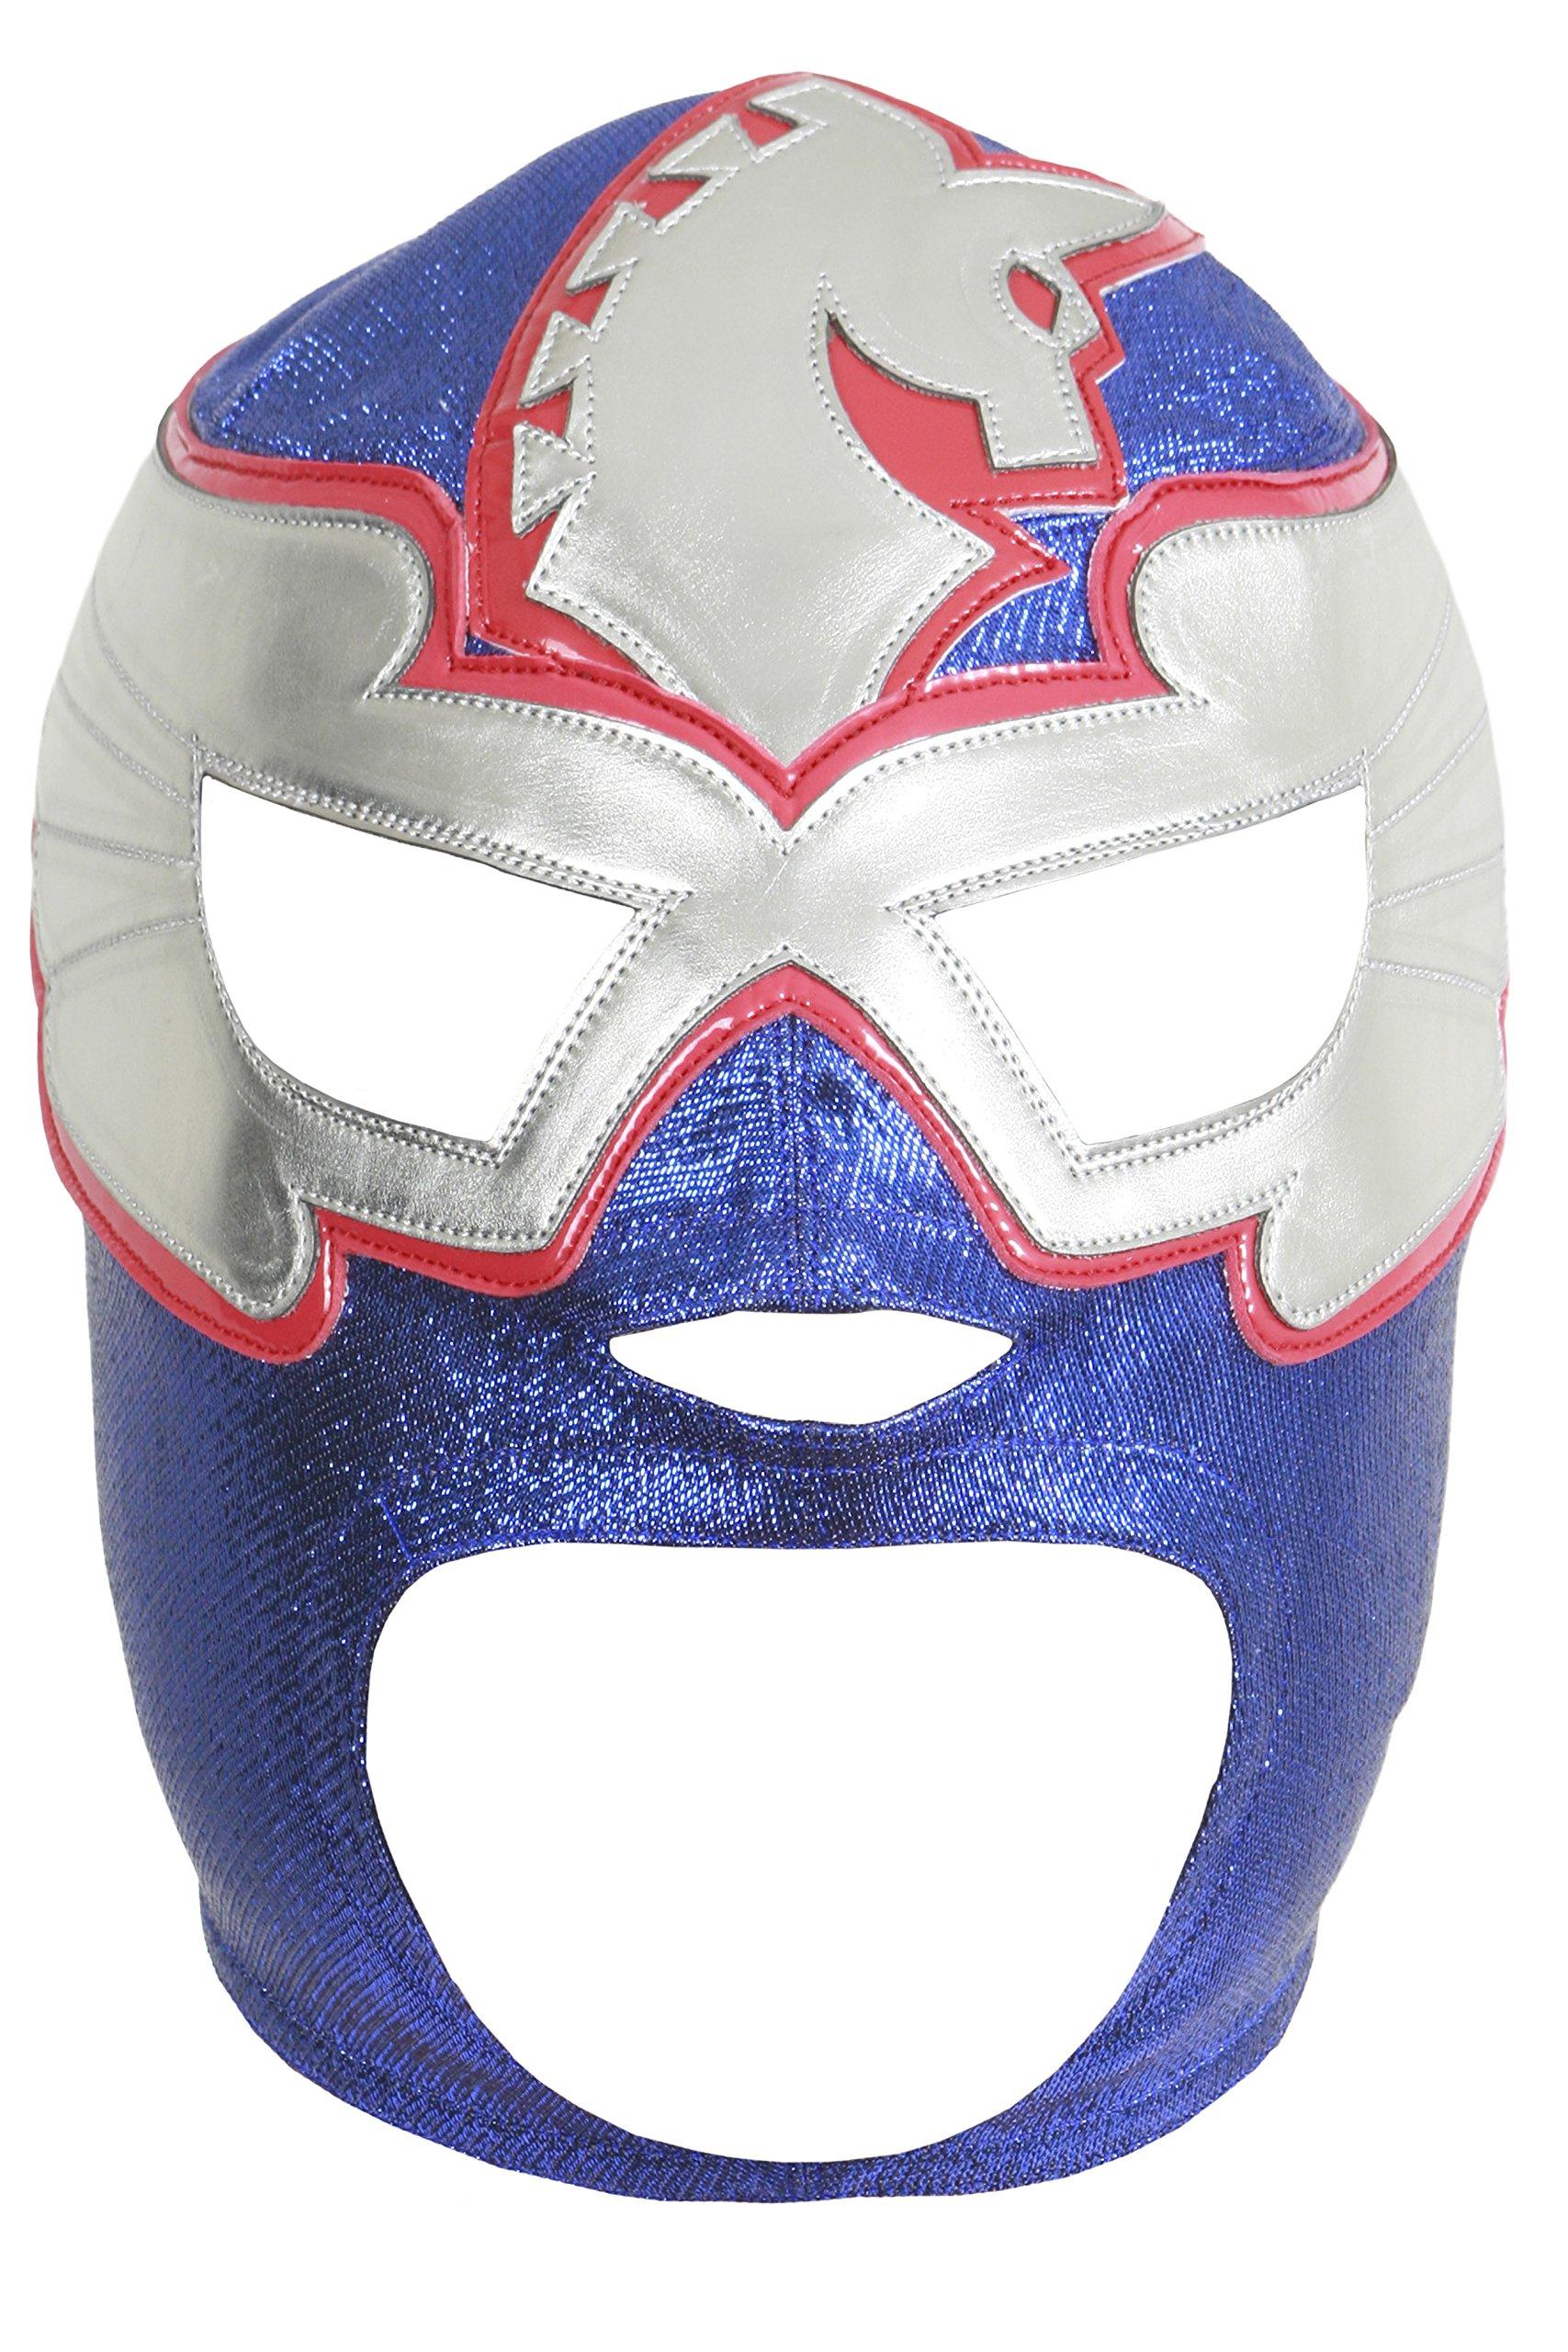 Deportes Martinez Pegasus Kid Professional Lucha Libre Mask Adult Luchador Mask Blue Red by Deportes Martinez